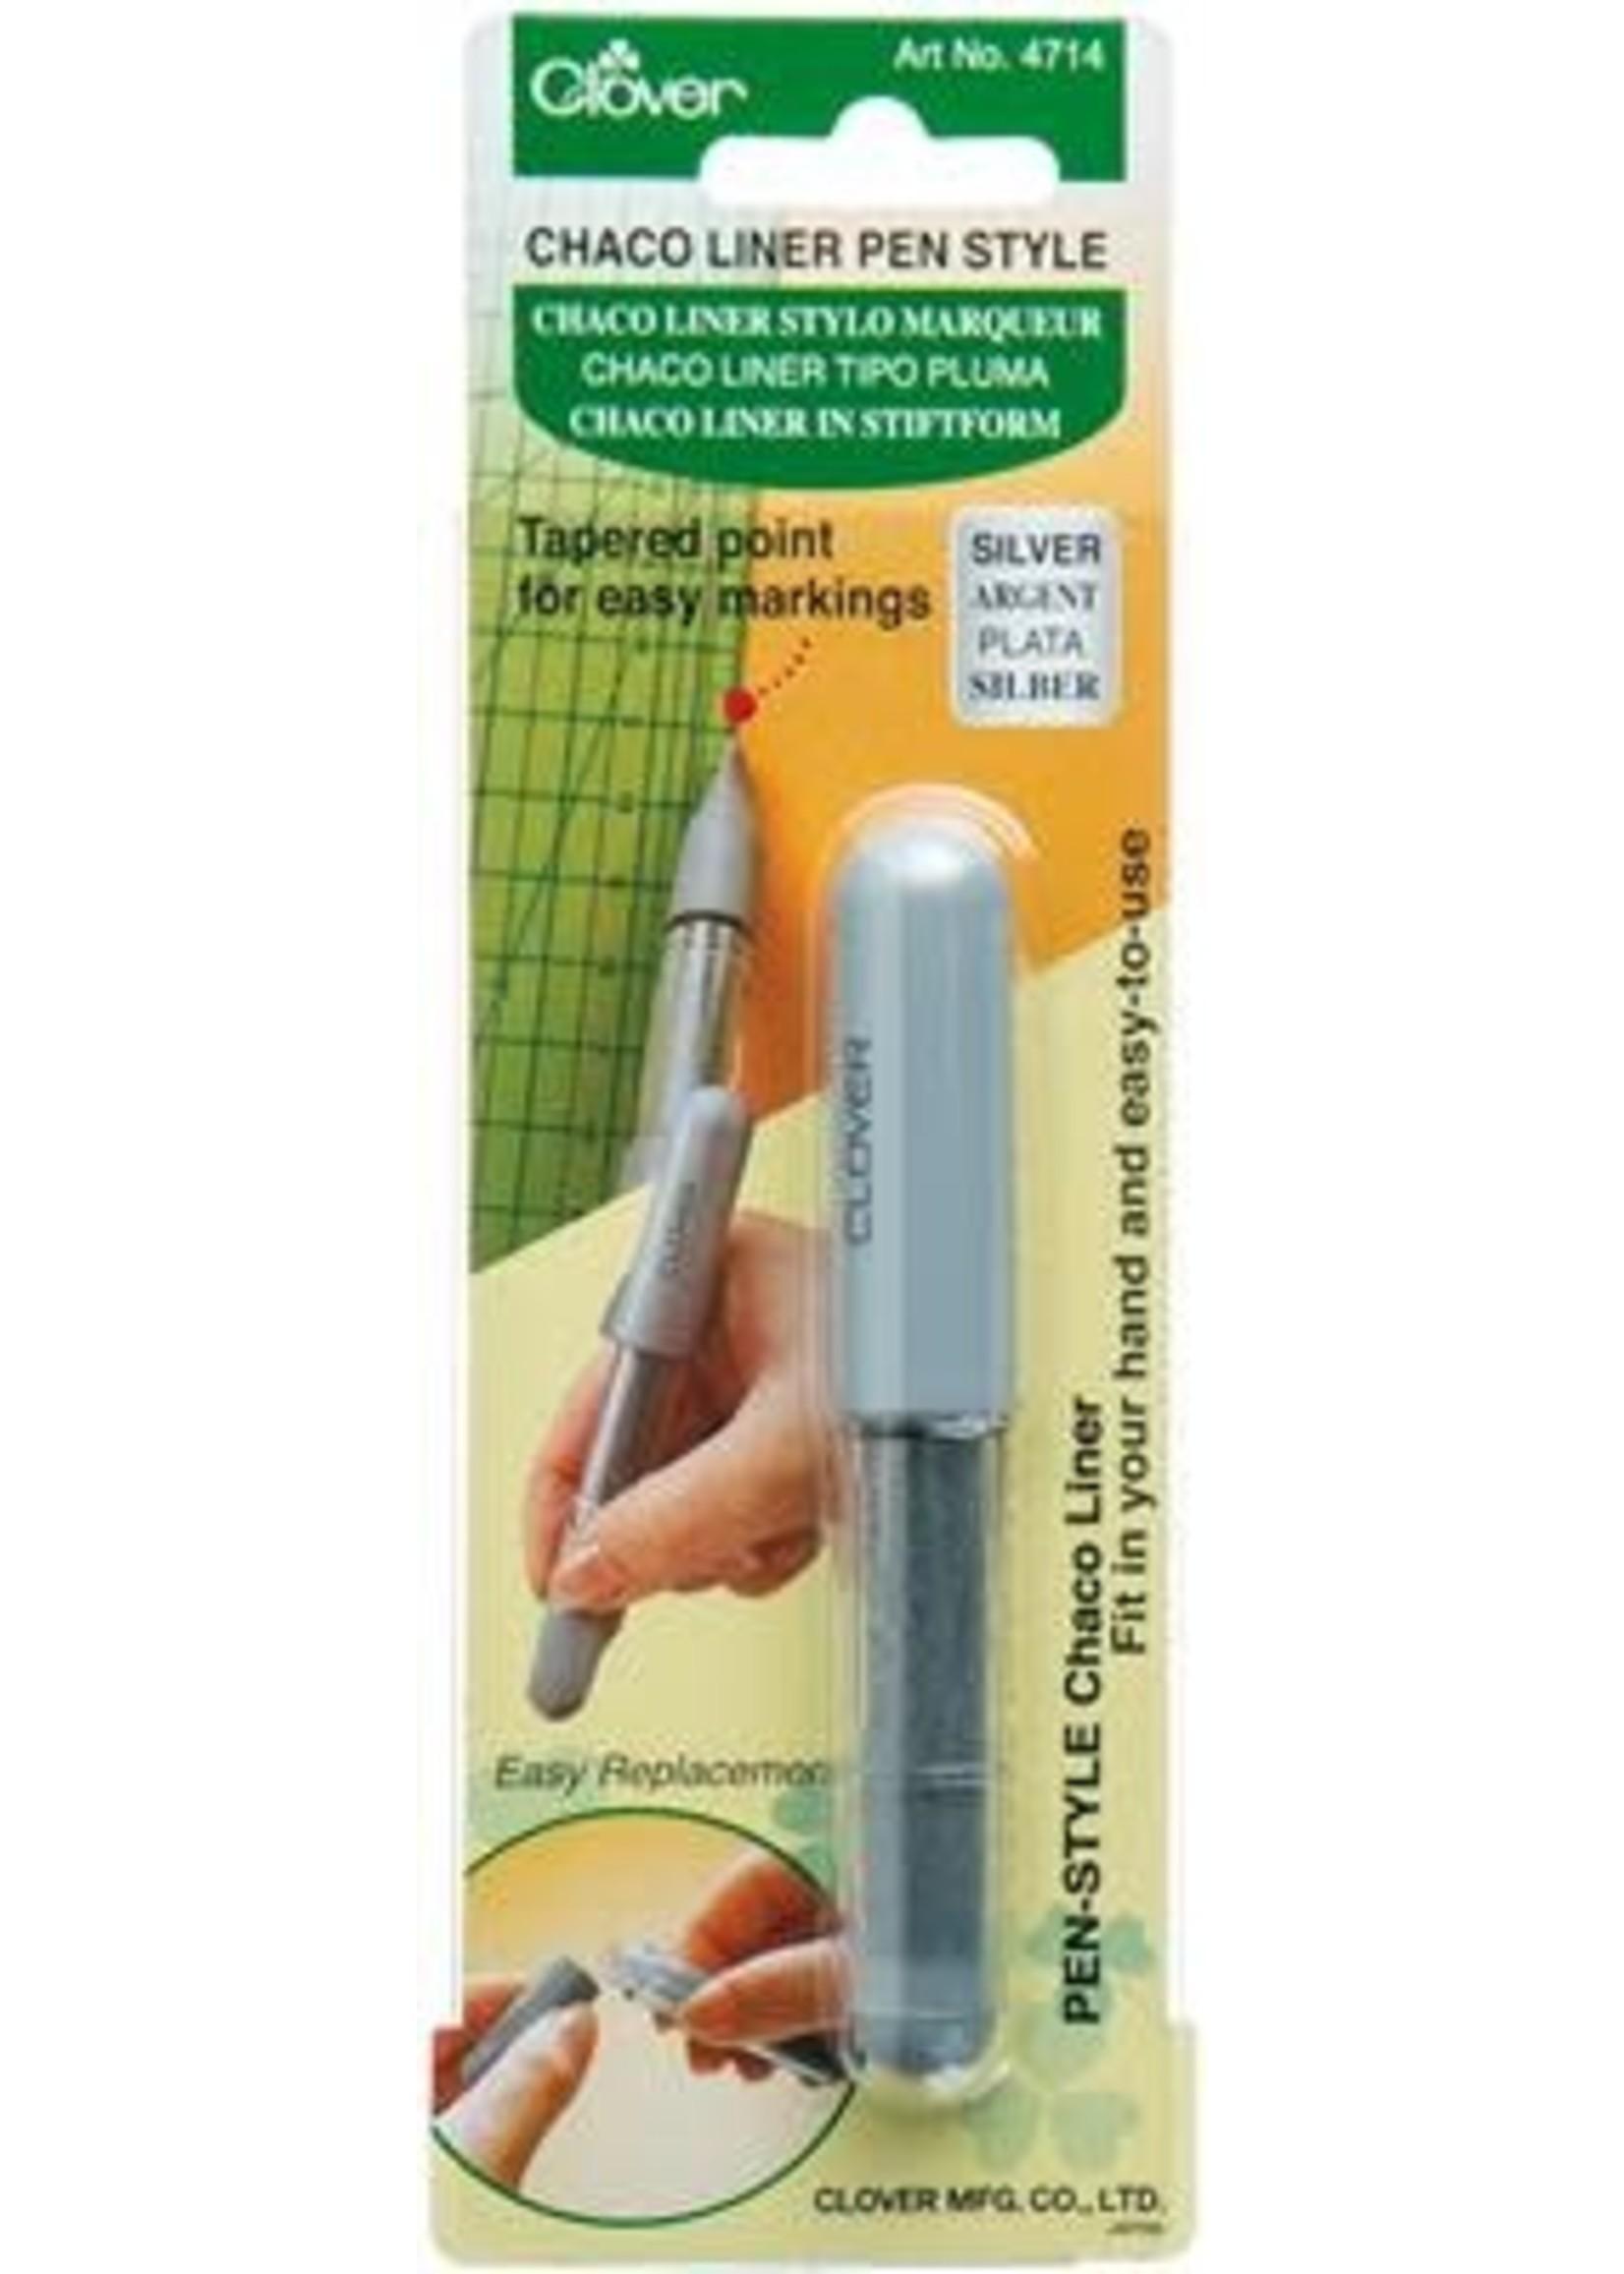 Clover Chaco Liner Pen - Zilver